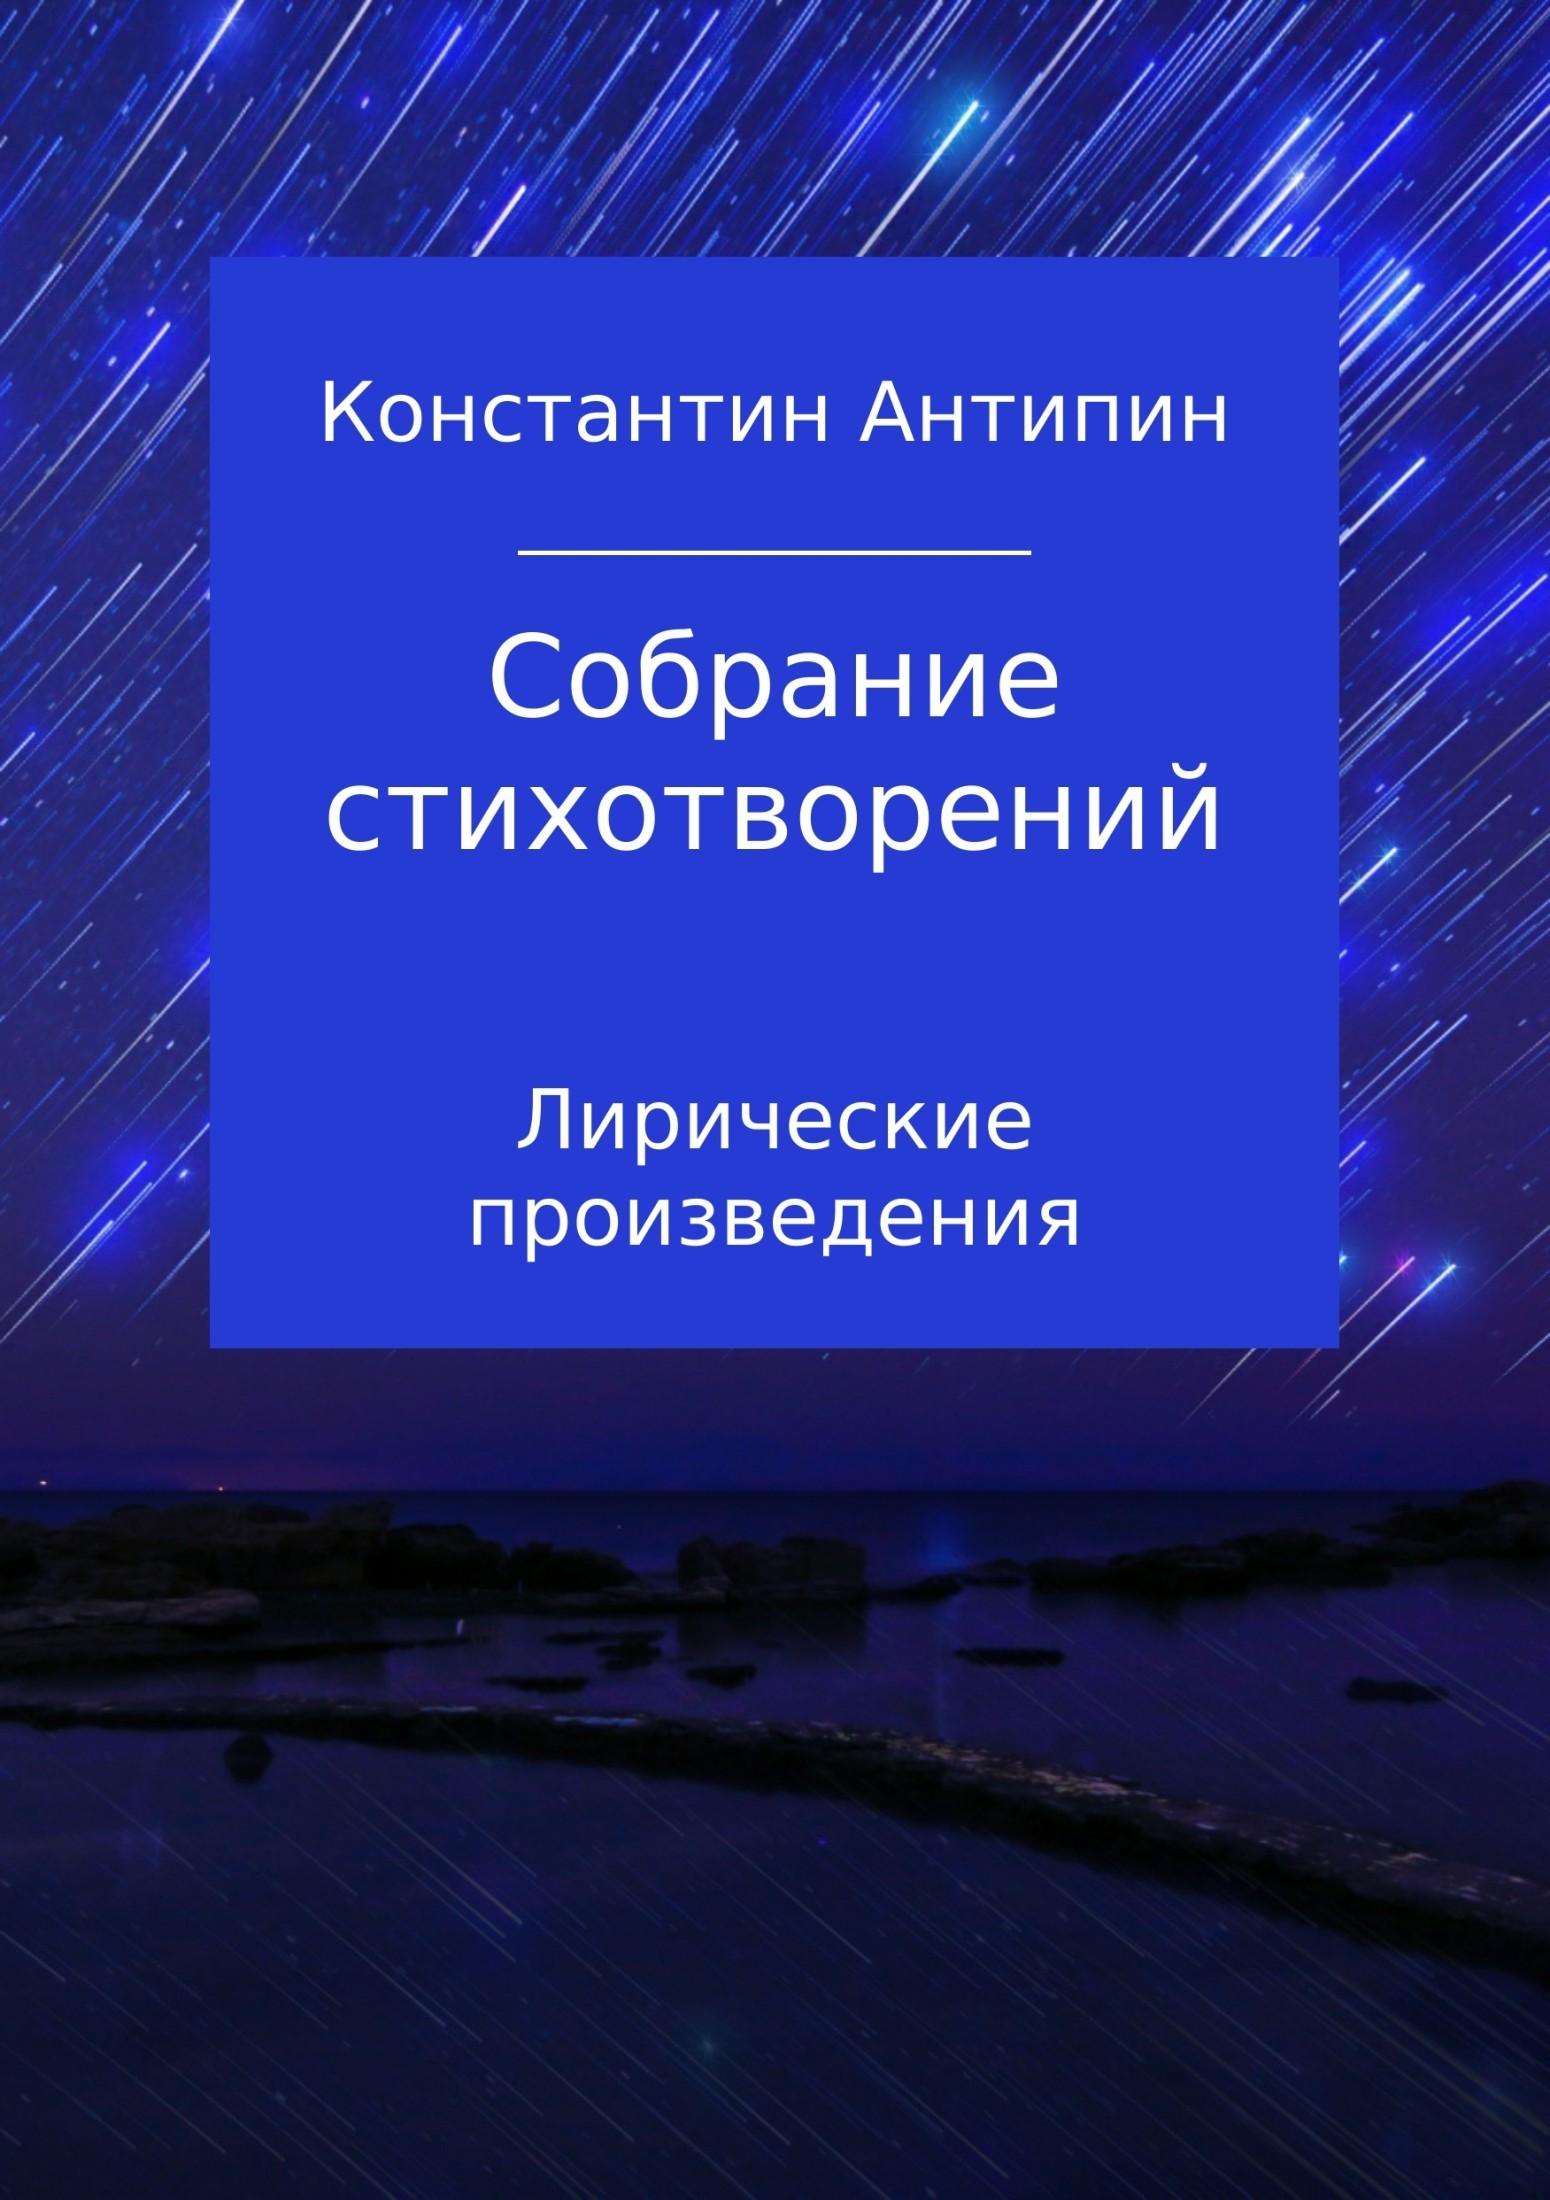 Константин Евгеньевич Антипин Собрание стихотворений александр суслов сундук собрание стихотворений